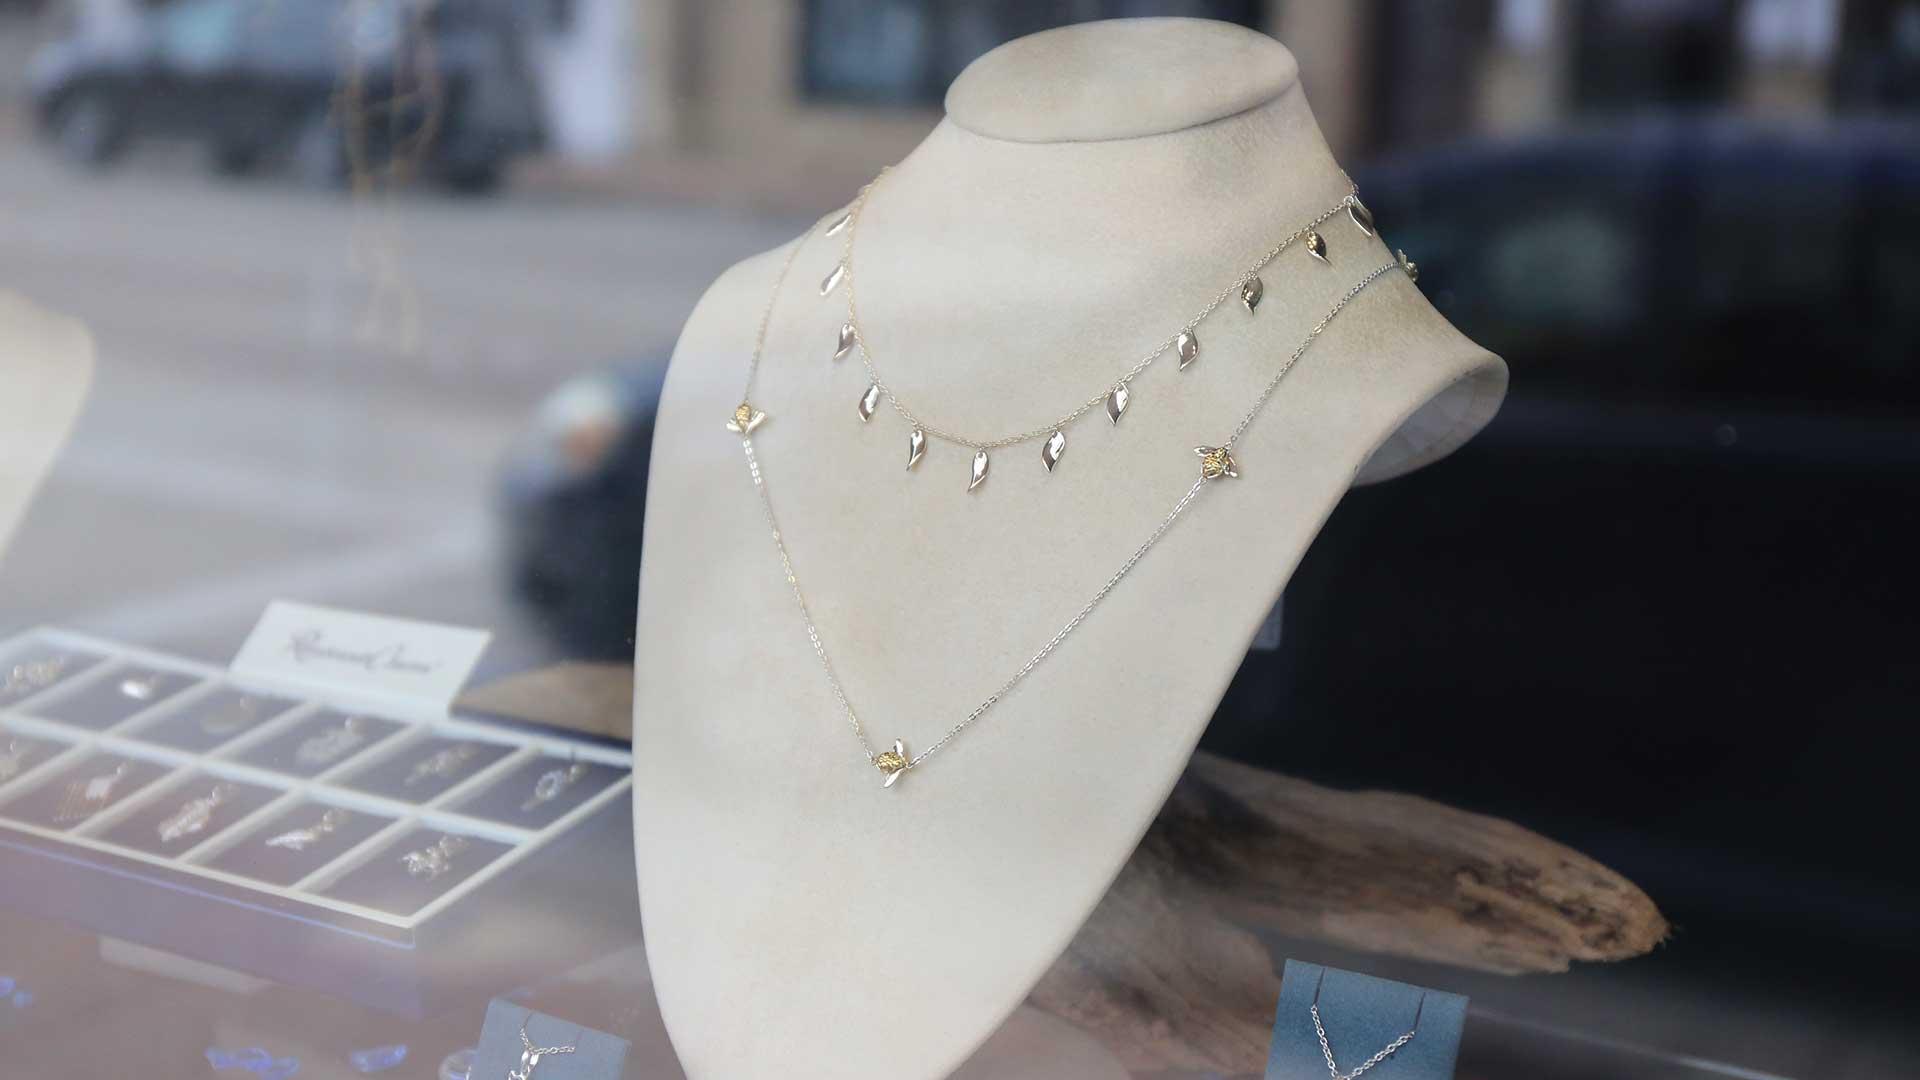 Bassett Jewelers - necklace